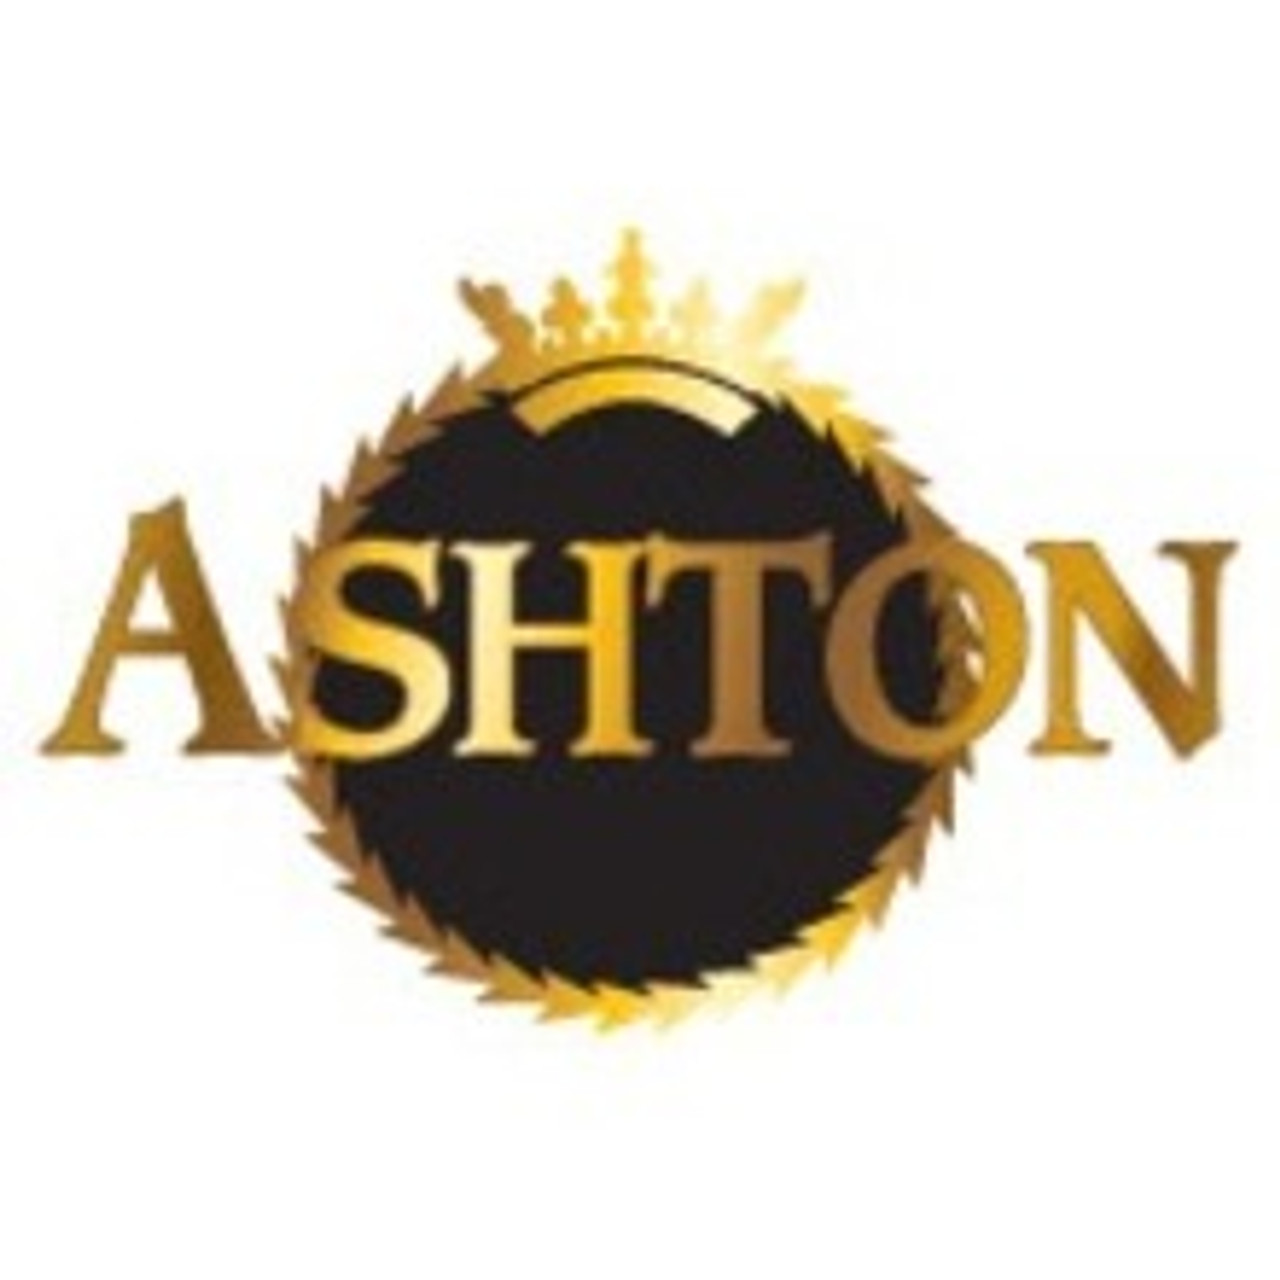 Ashton Cabinet No. 2 Cigars - 7 x 46 (Cedar Chest of 20)